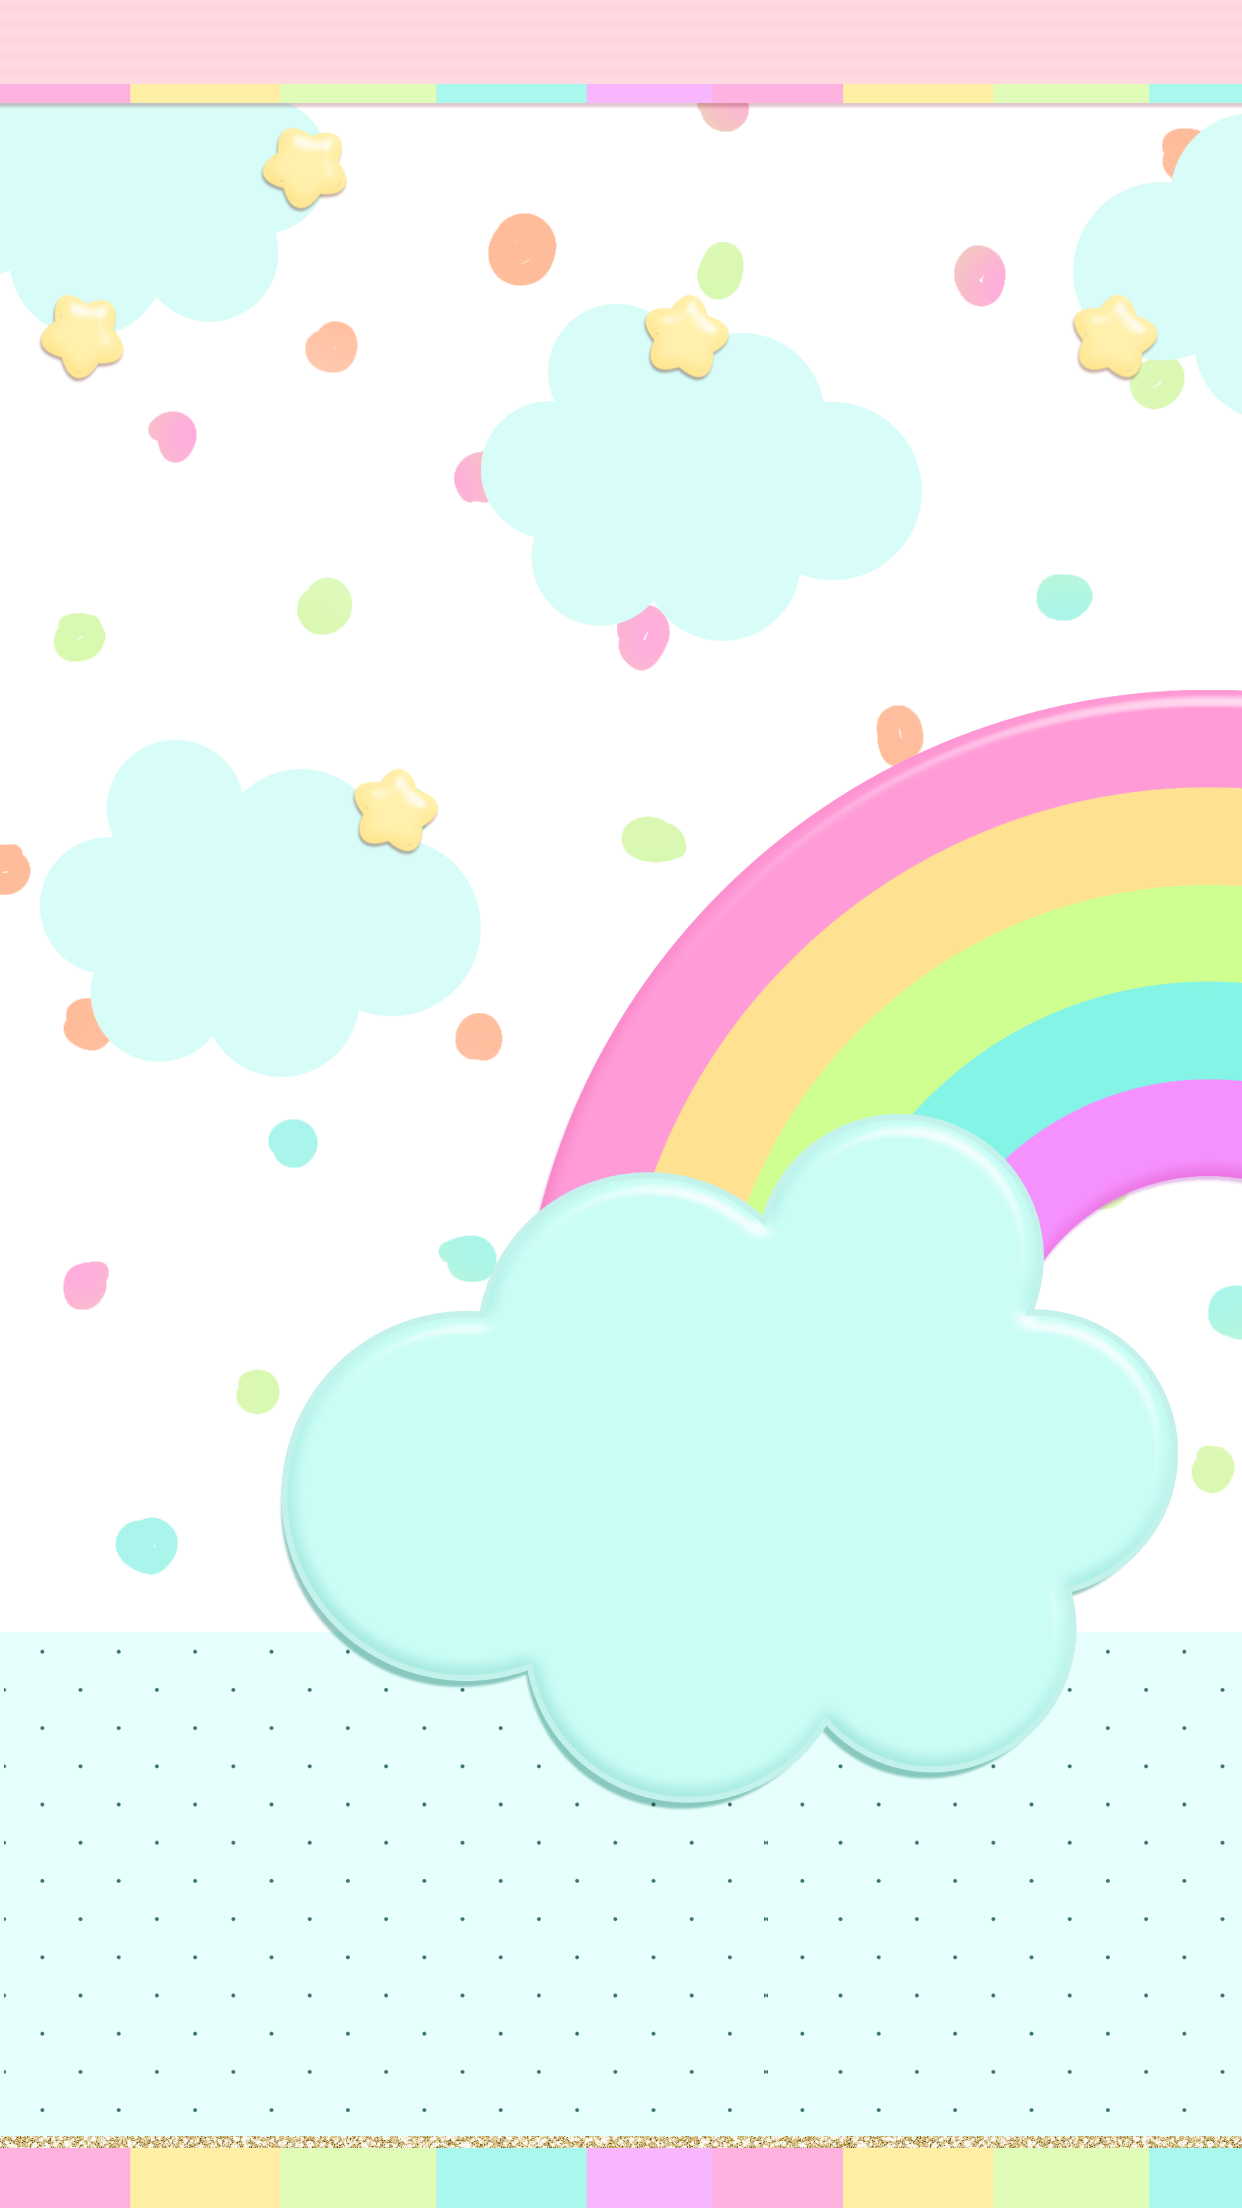 Dormitorio jard/ín de Infancia 30x40cmx3No Framed Unicornio decoraci/ón Infantil Decoraci/ón para habitaci/ón de ni/ña Generic Lienzo para ni/ños Arco Iris Colorido para la Pared